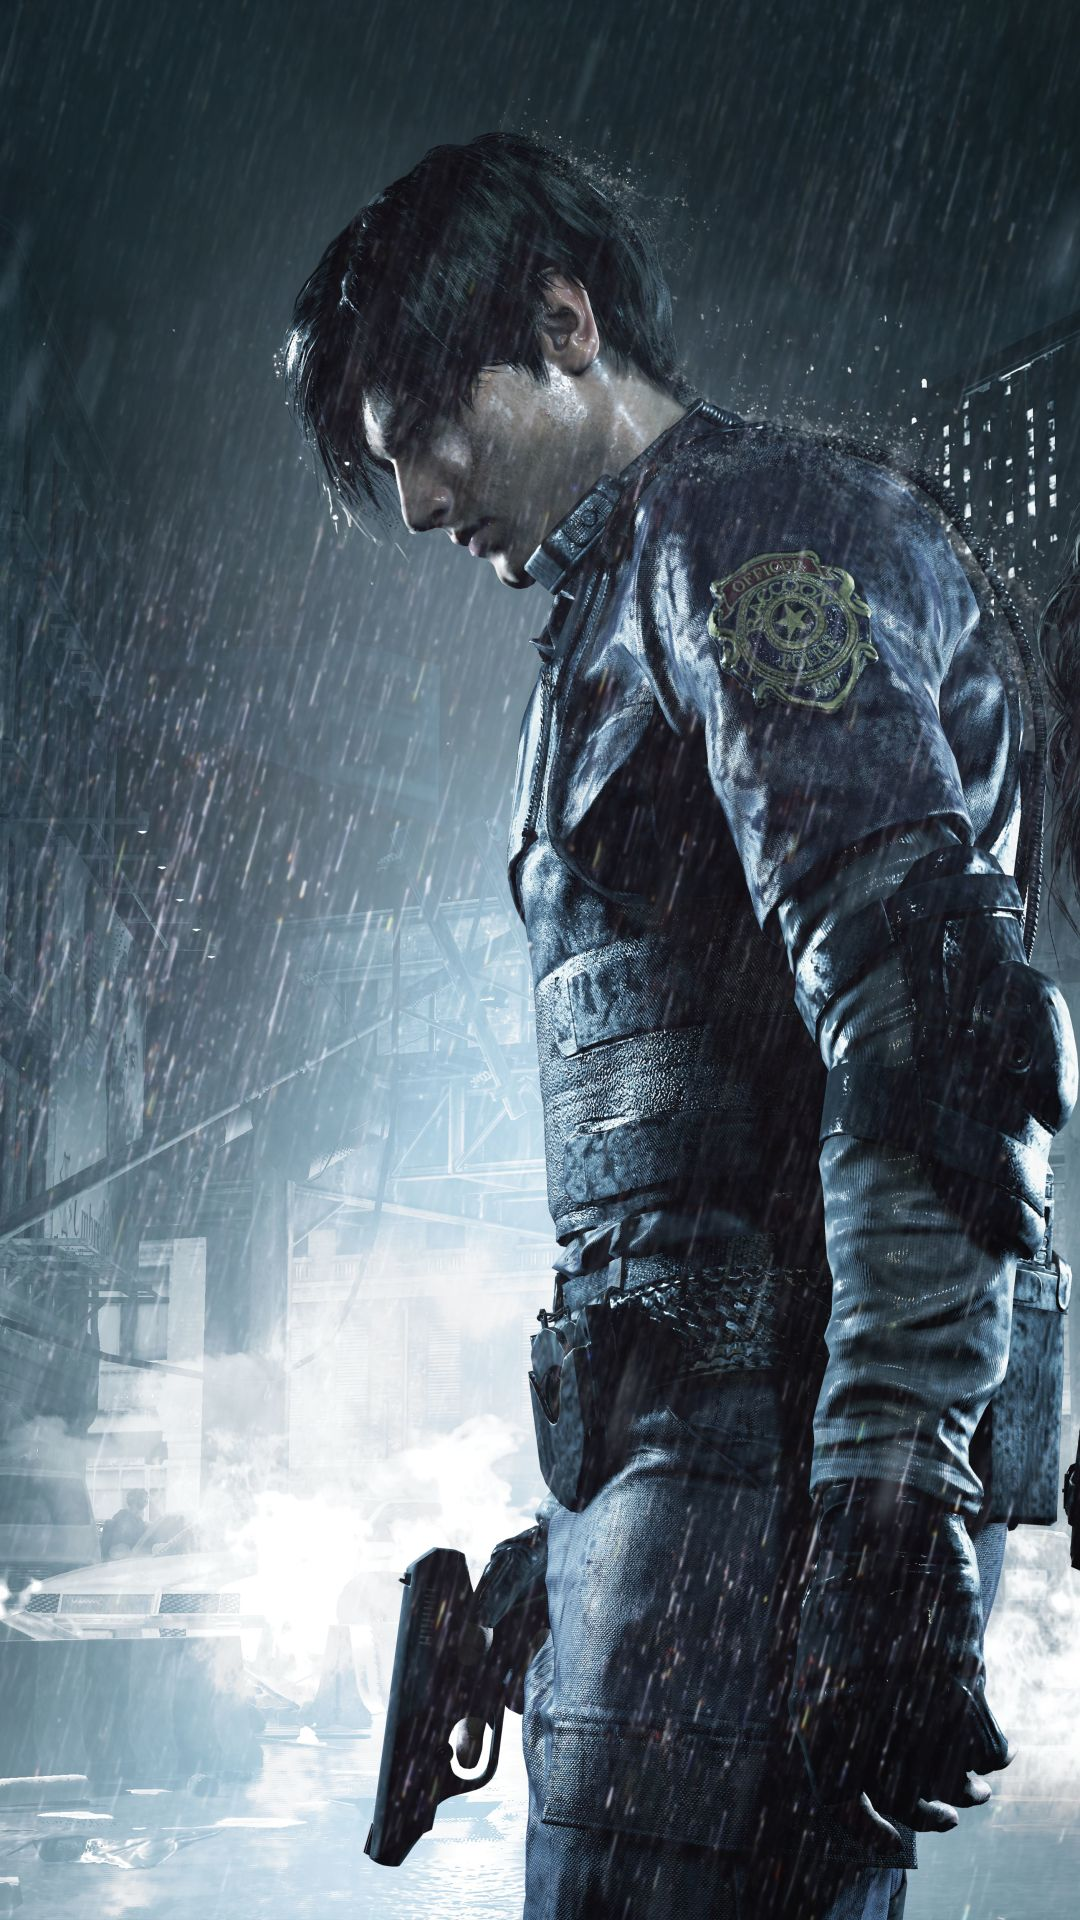 Hd Wallpaper 89 Com Imagens Resident Evil Jogos Personagens